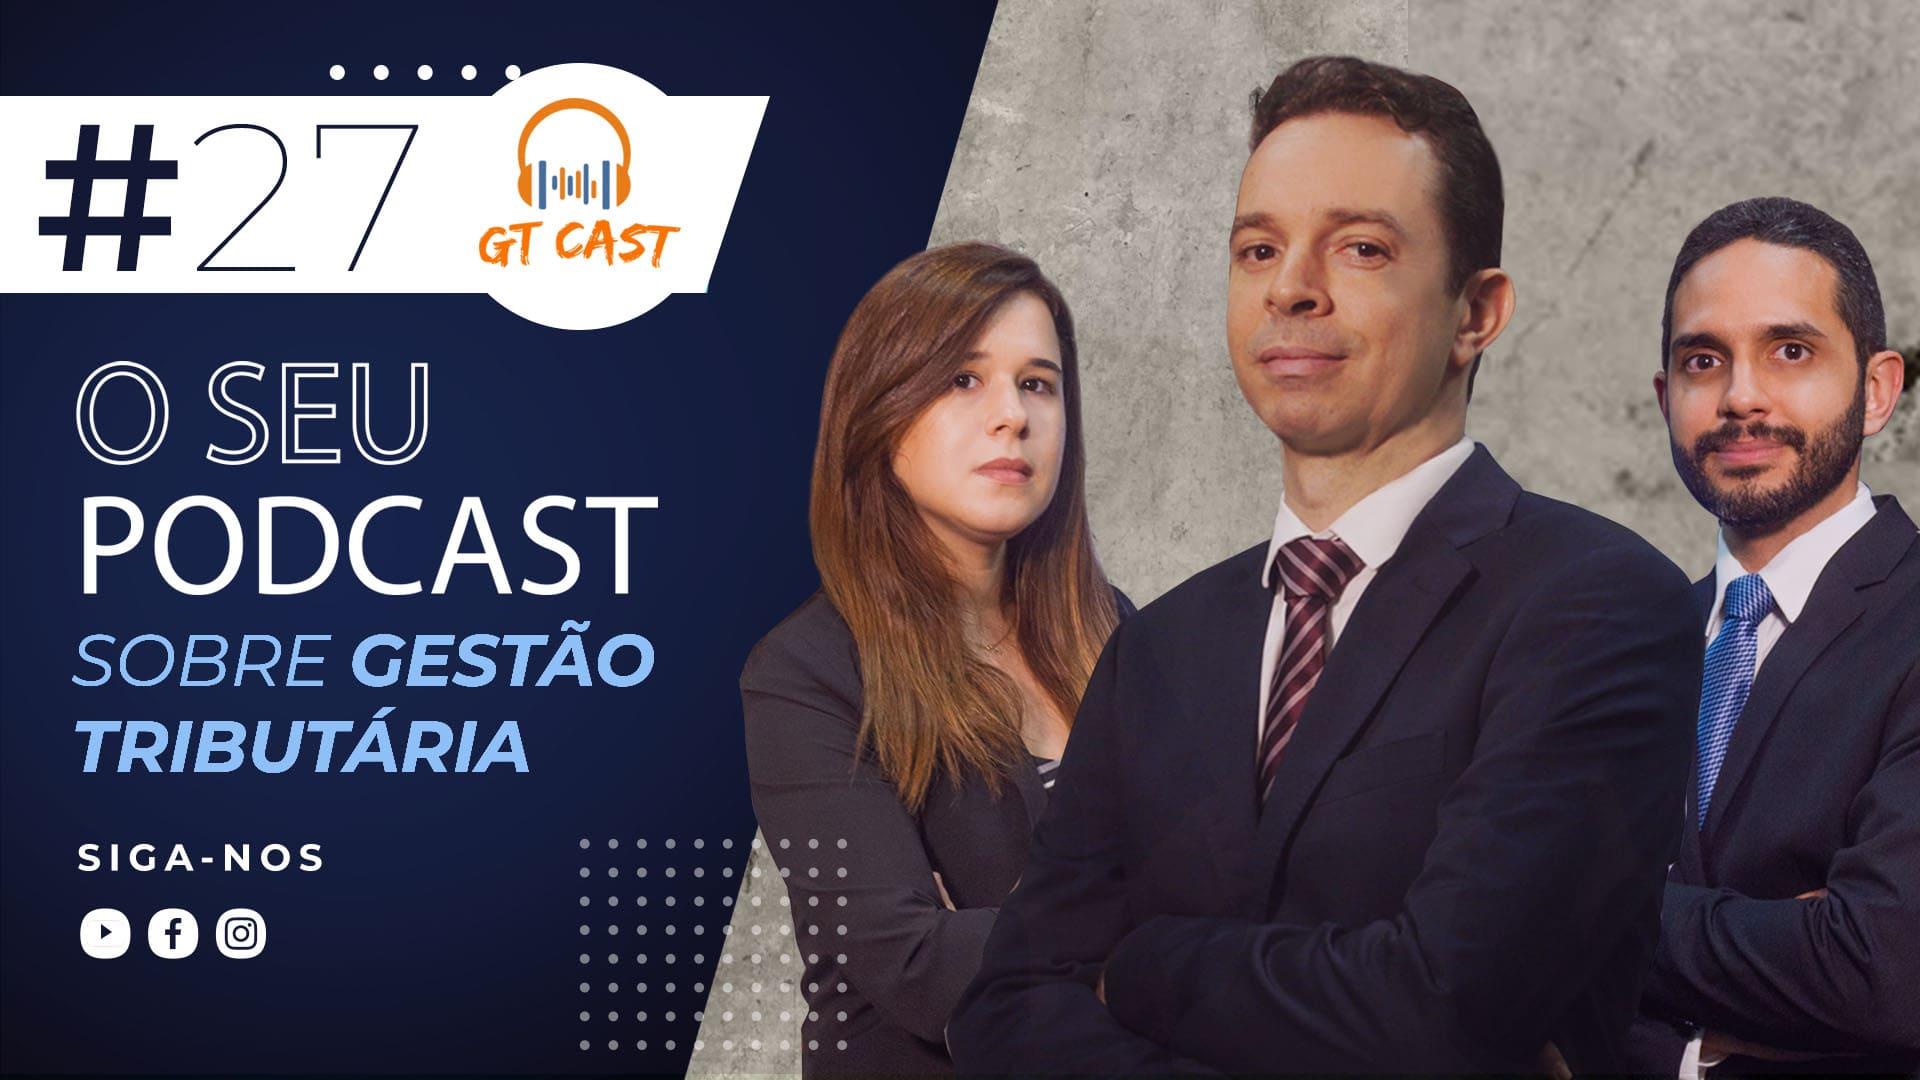 gt-cast-27-marco-2021-o-seu-podcast-sobre-gestao-tributaria